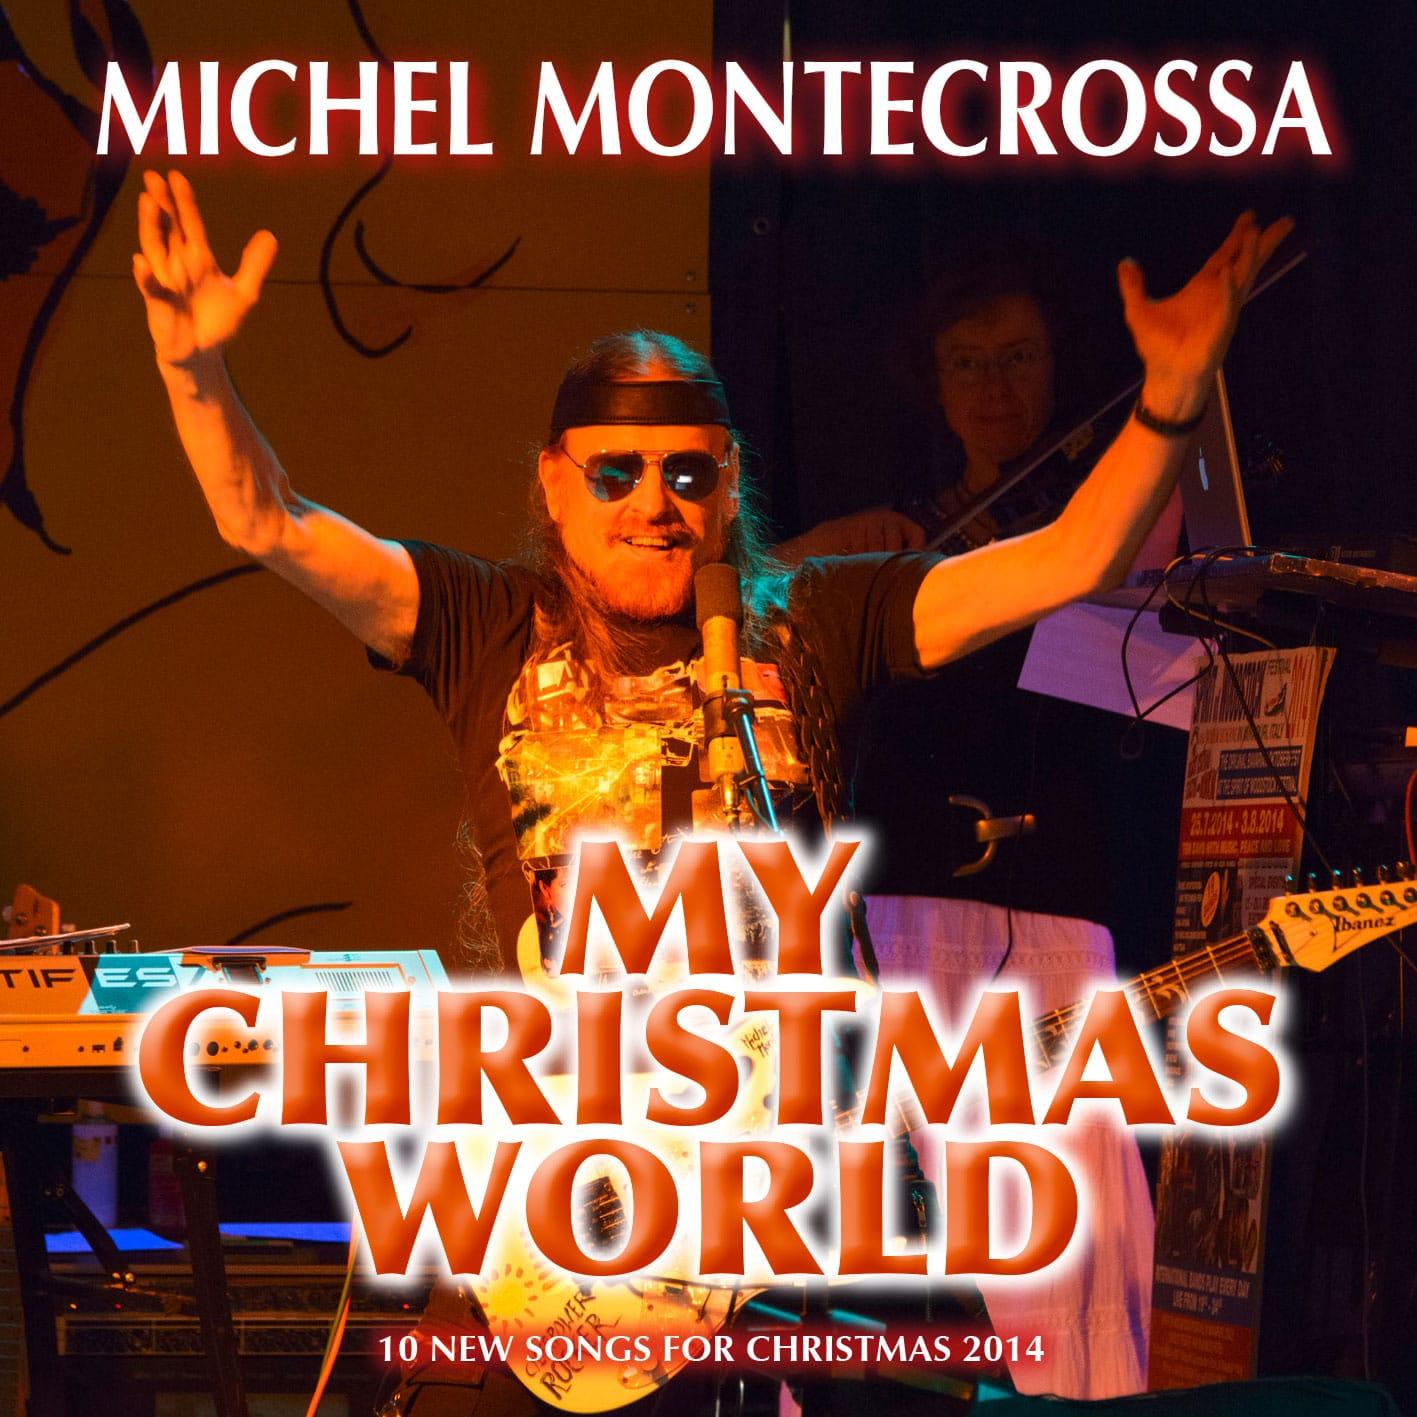 My Christmas World